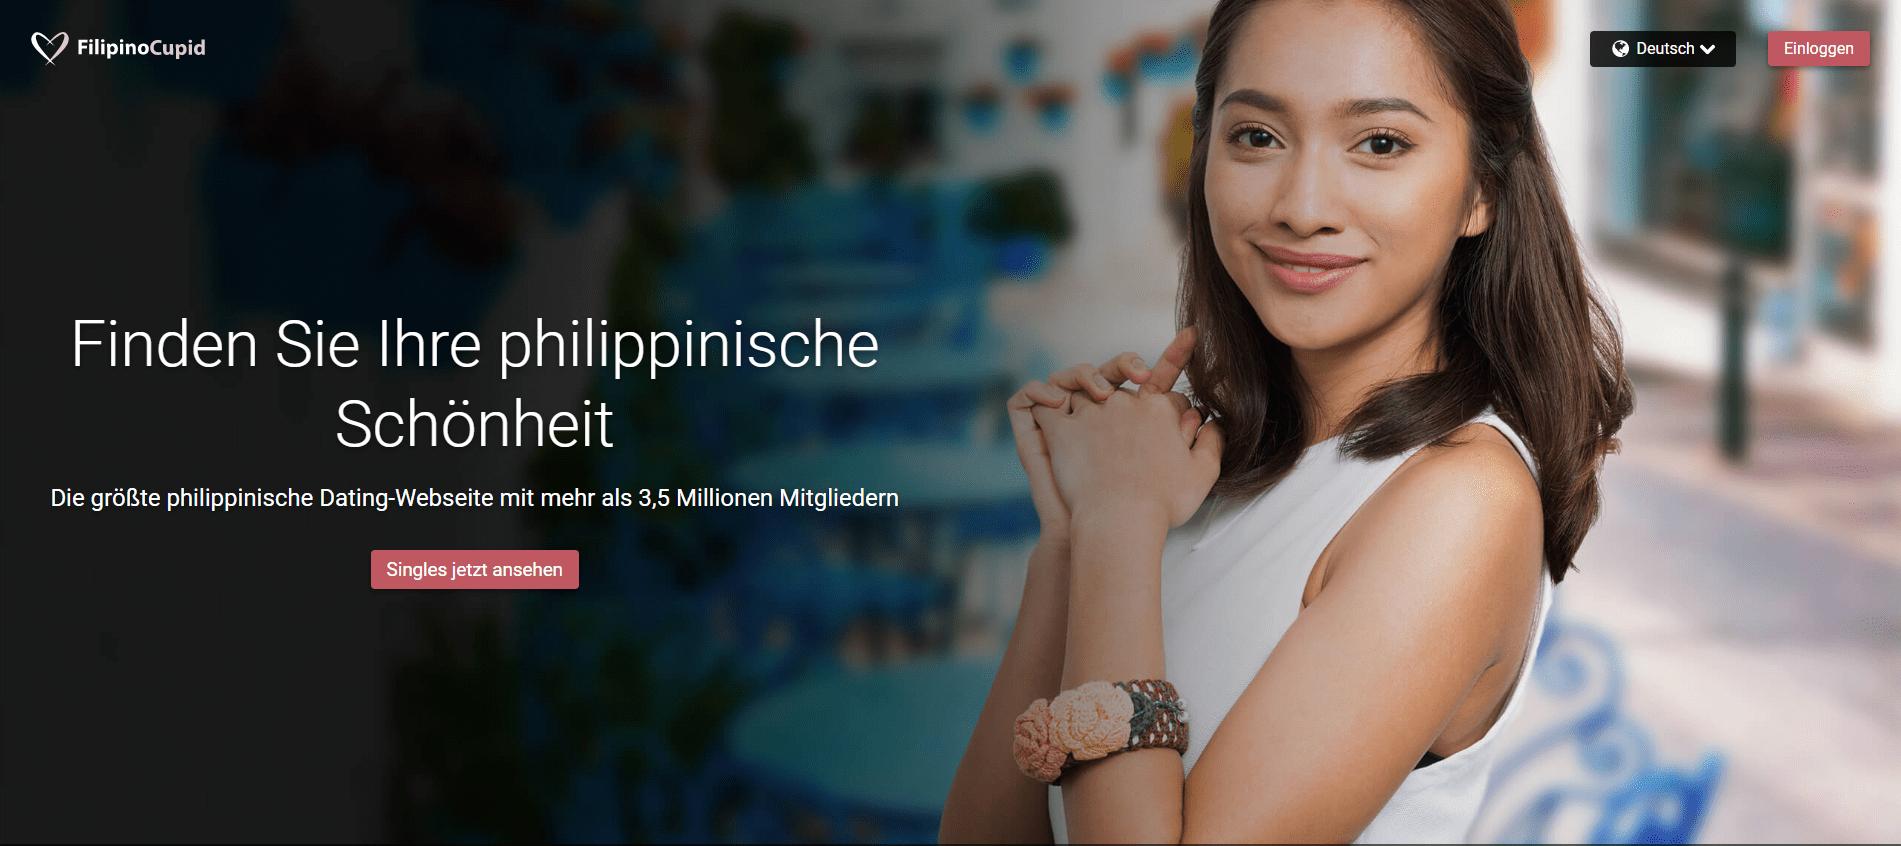 FilipinoCupid.com Pros und Contras